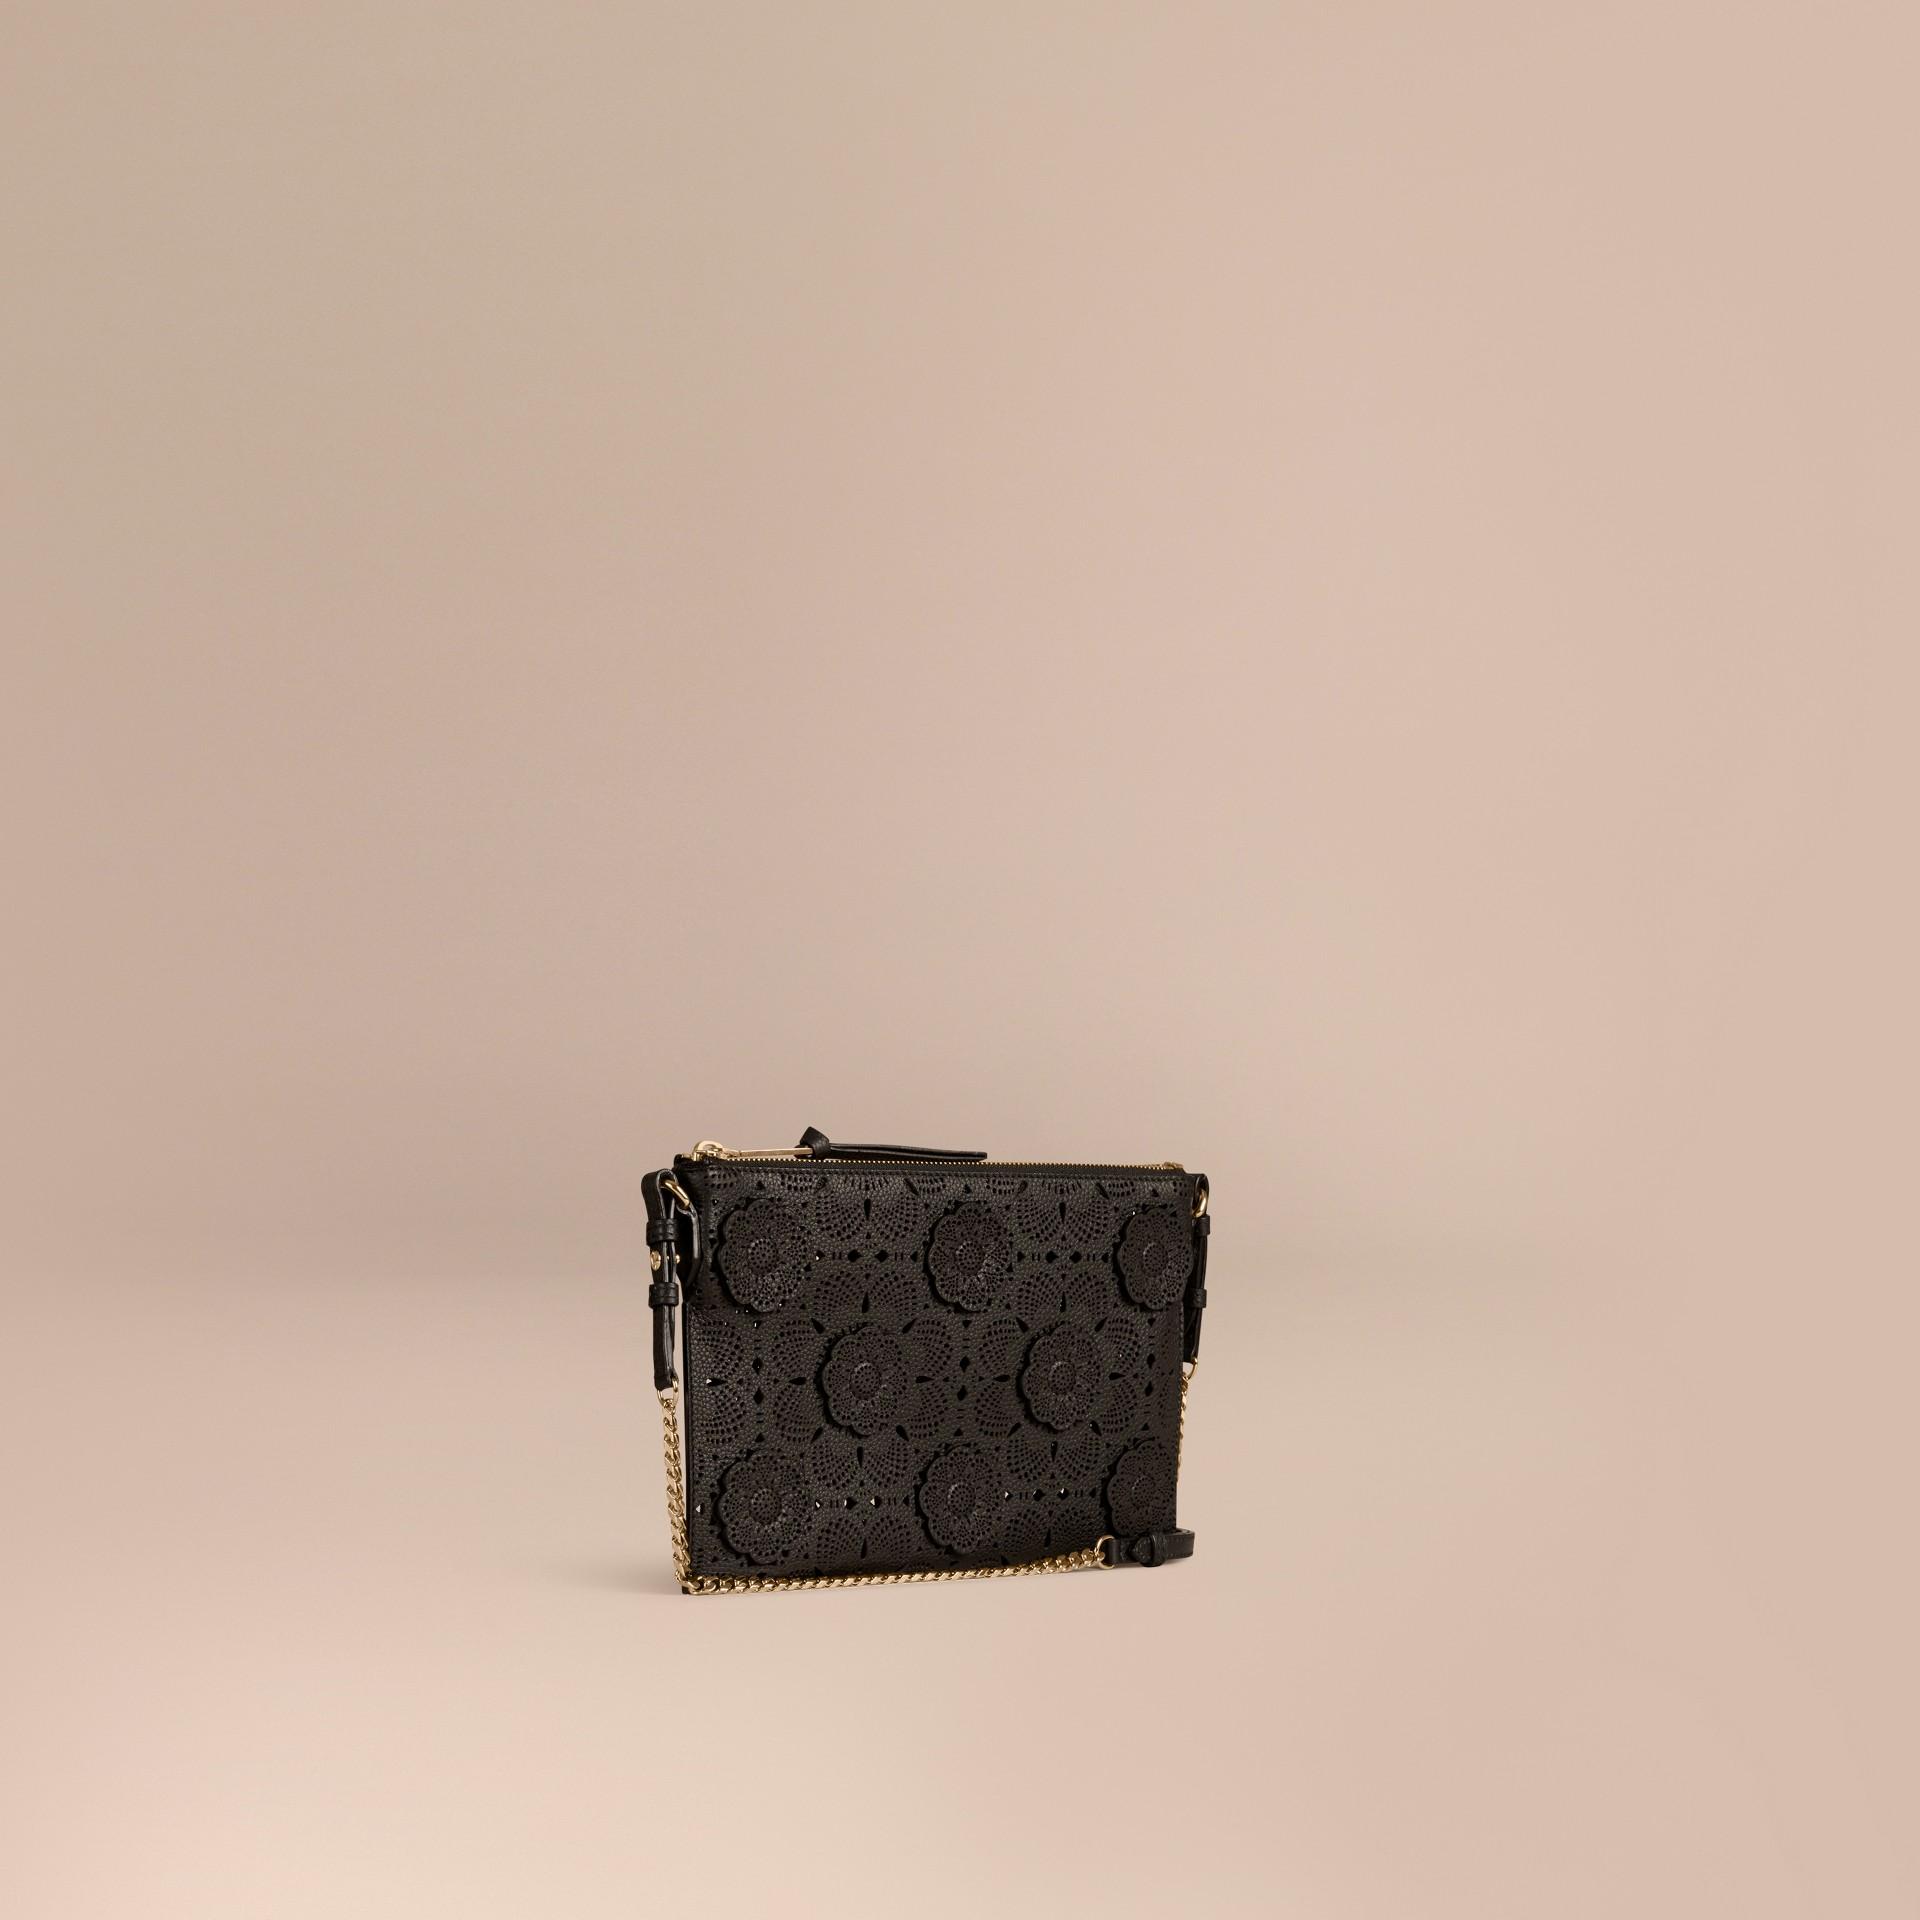 Black Laser-cut Floral Lace Leather Clutch Bag Black - gallery image 1